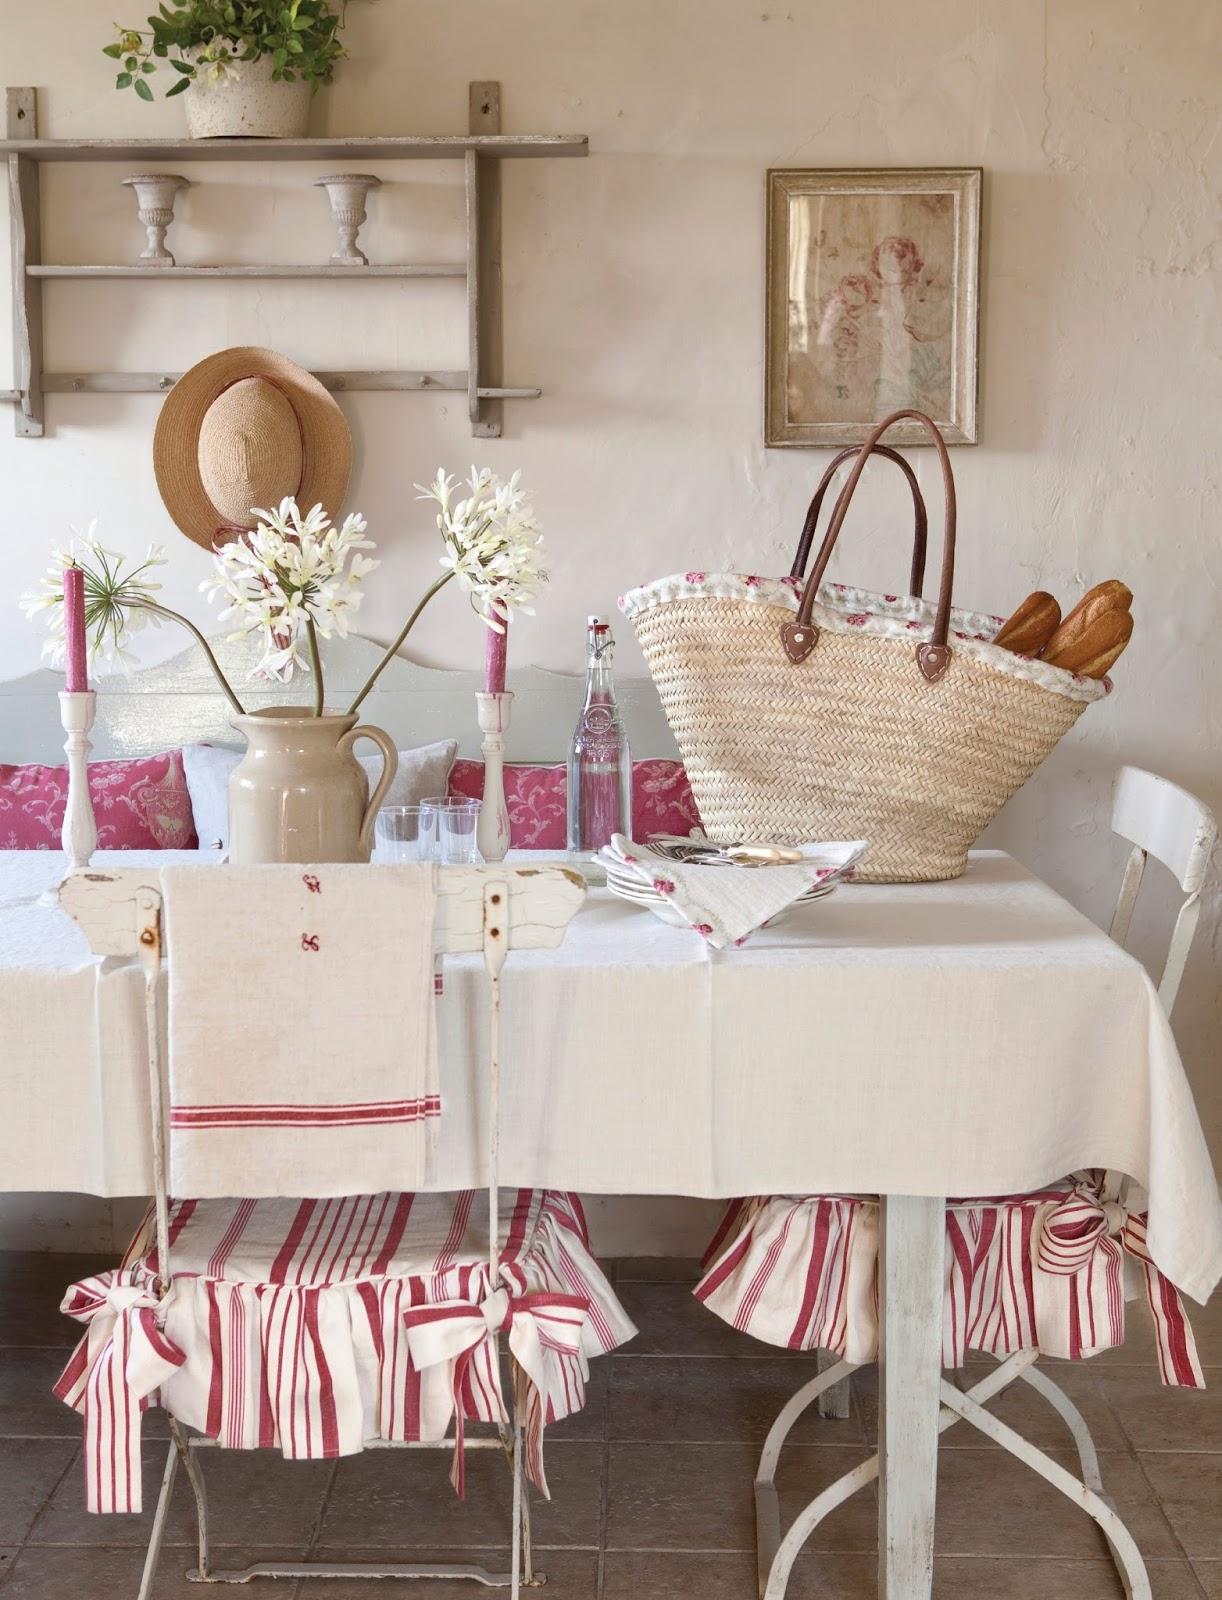 french country kitchen chair cushions wing back recliner slipcover evimi seviyorum kirmizinin en pastel halİ